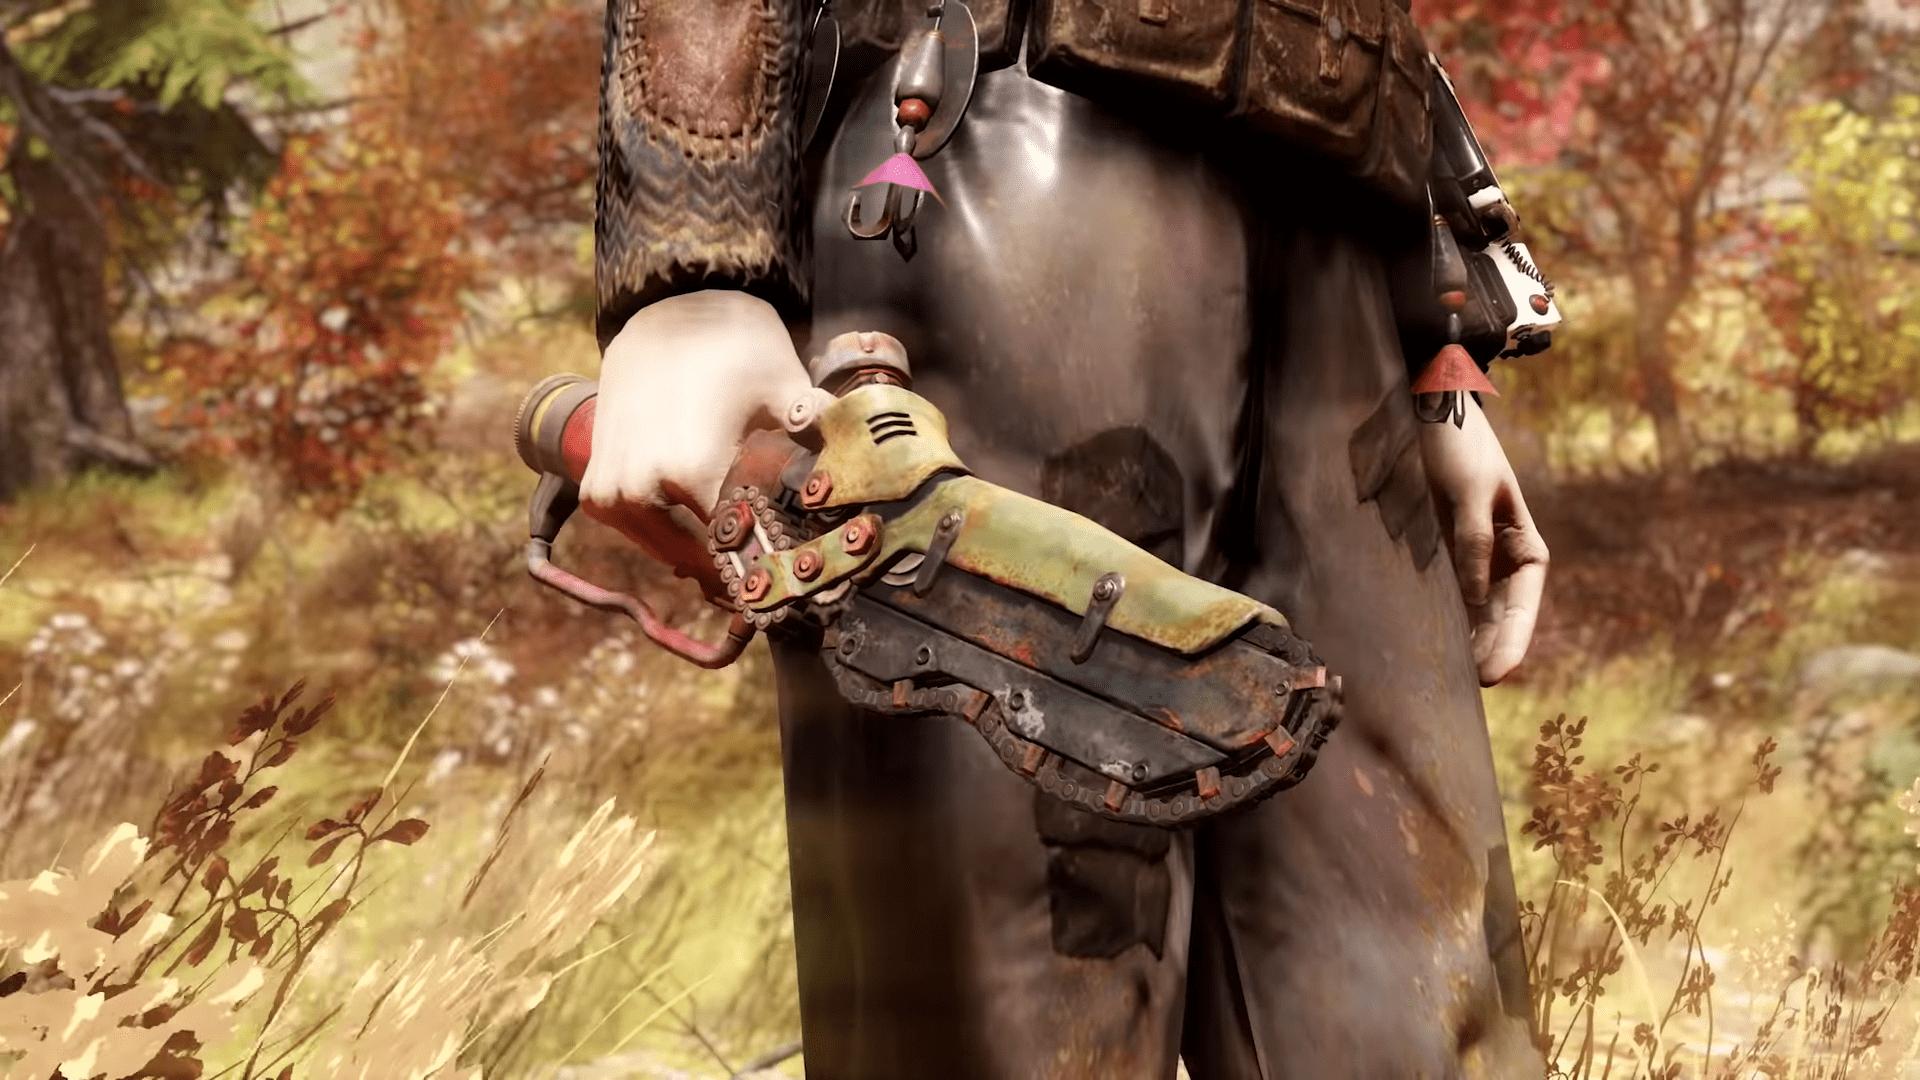 Fallout 76 Dupe Glitch 2019